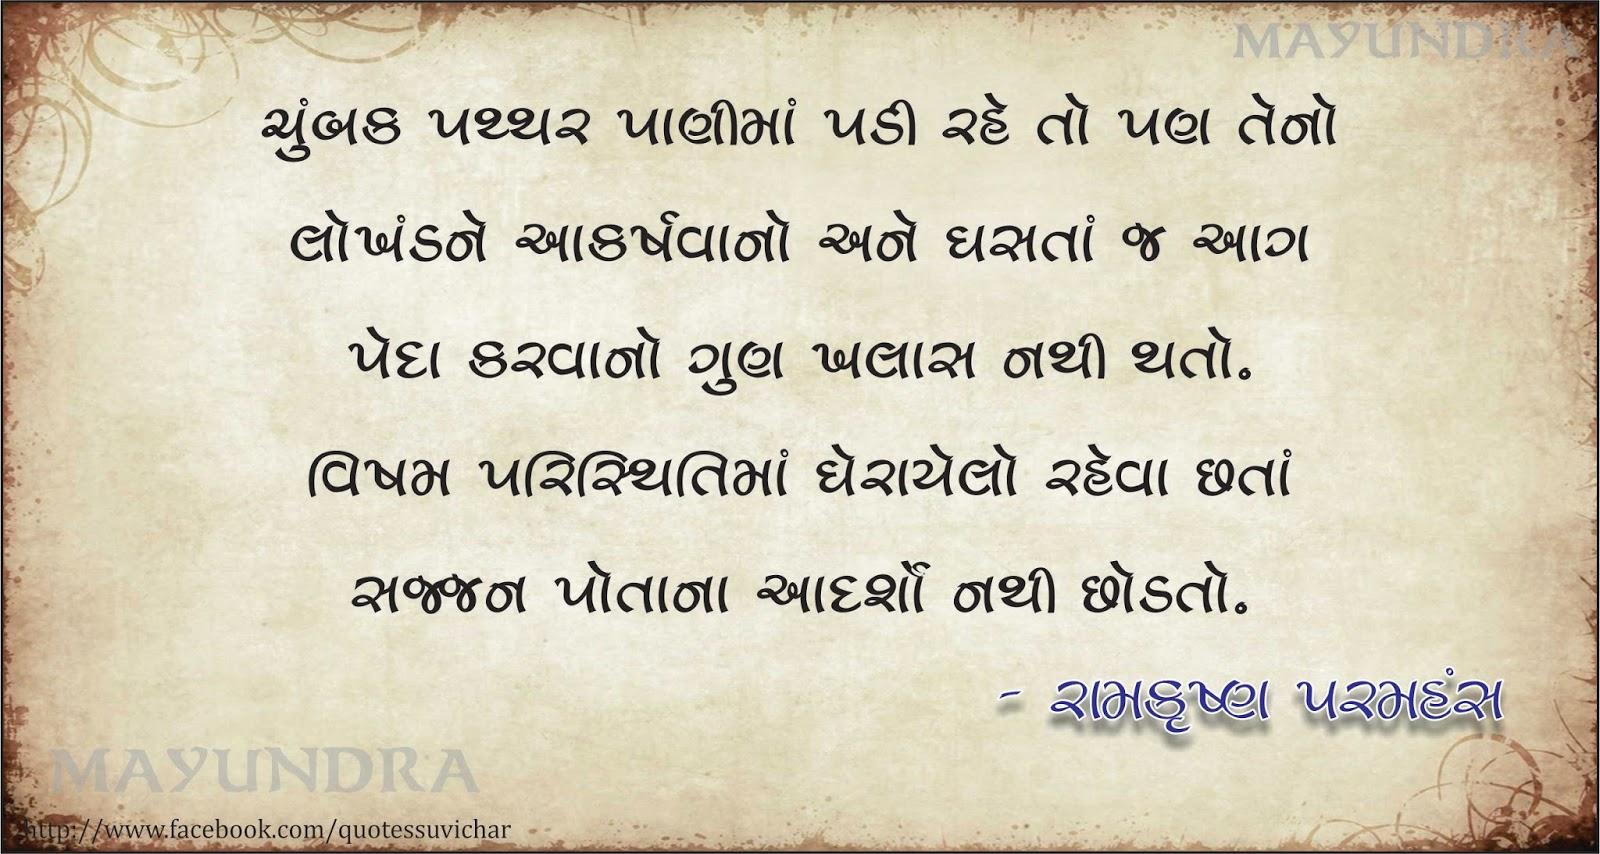 gujarati quotes ramkrishna paramhansa quotes india